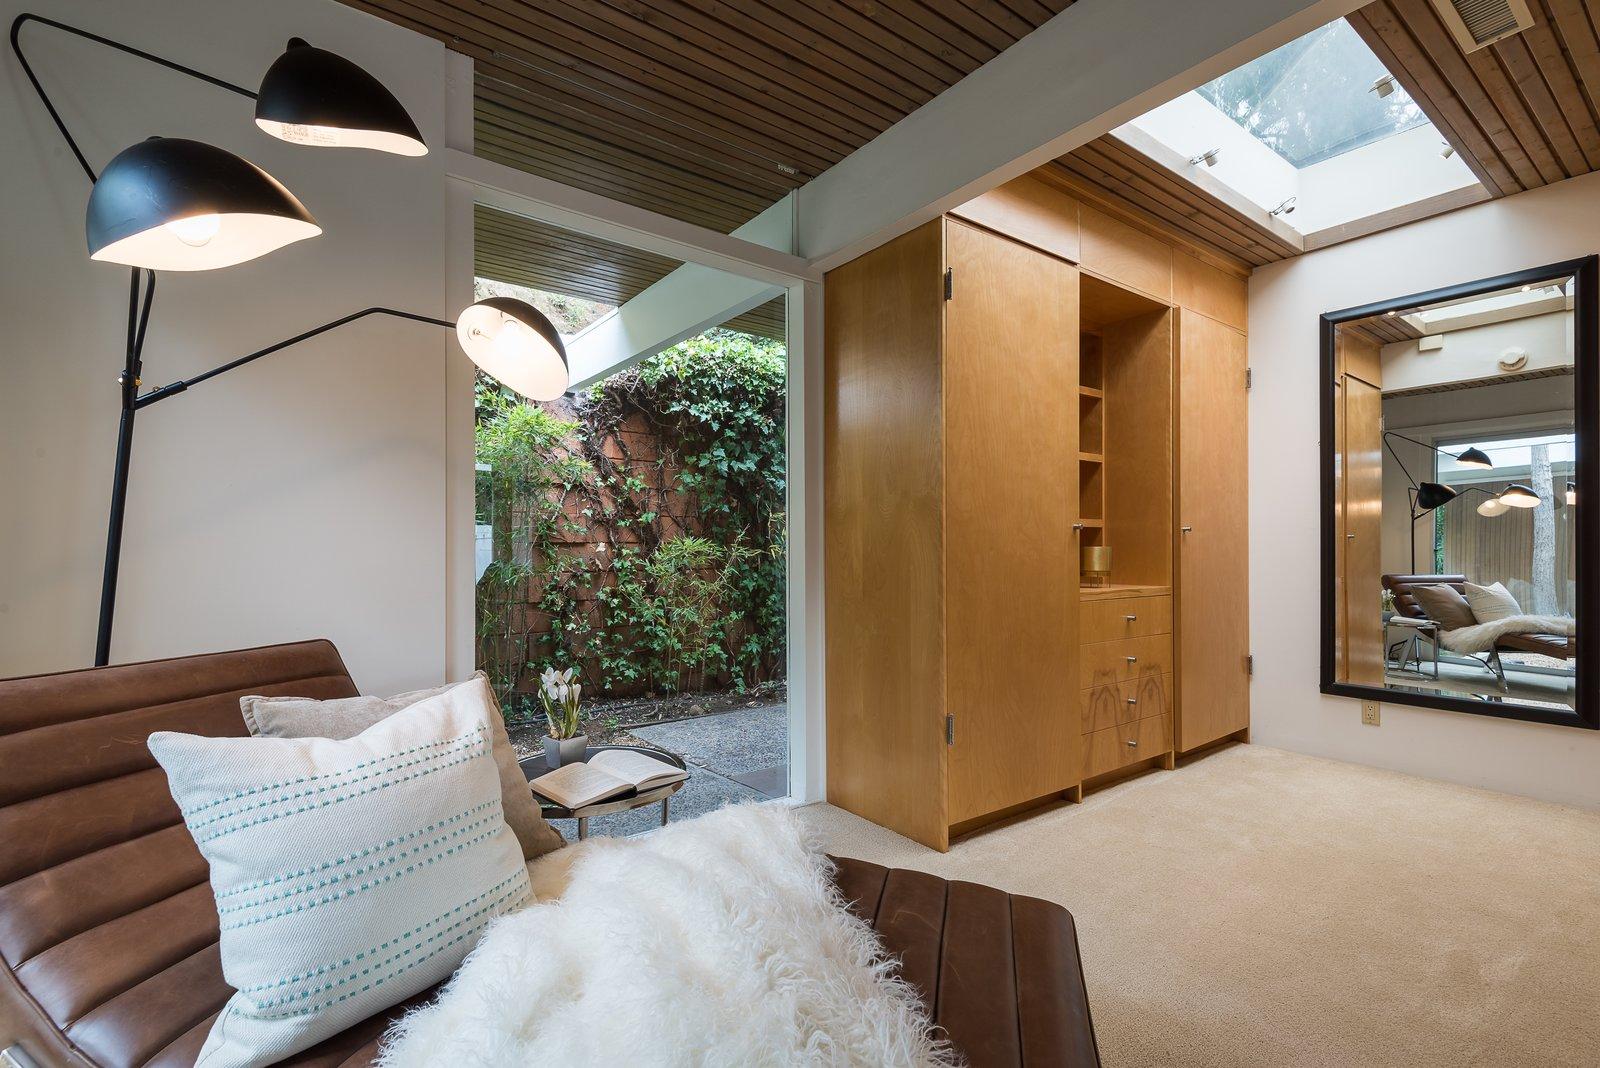 Skylights enhance the indoor-outdoor feel.